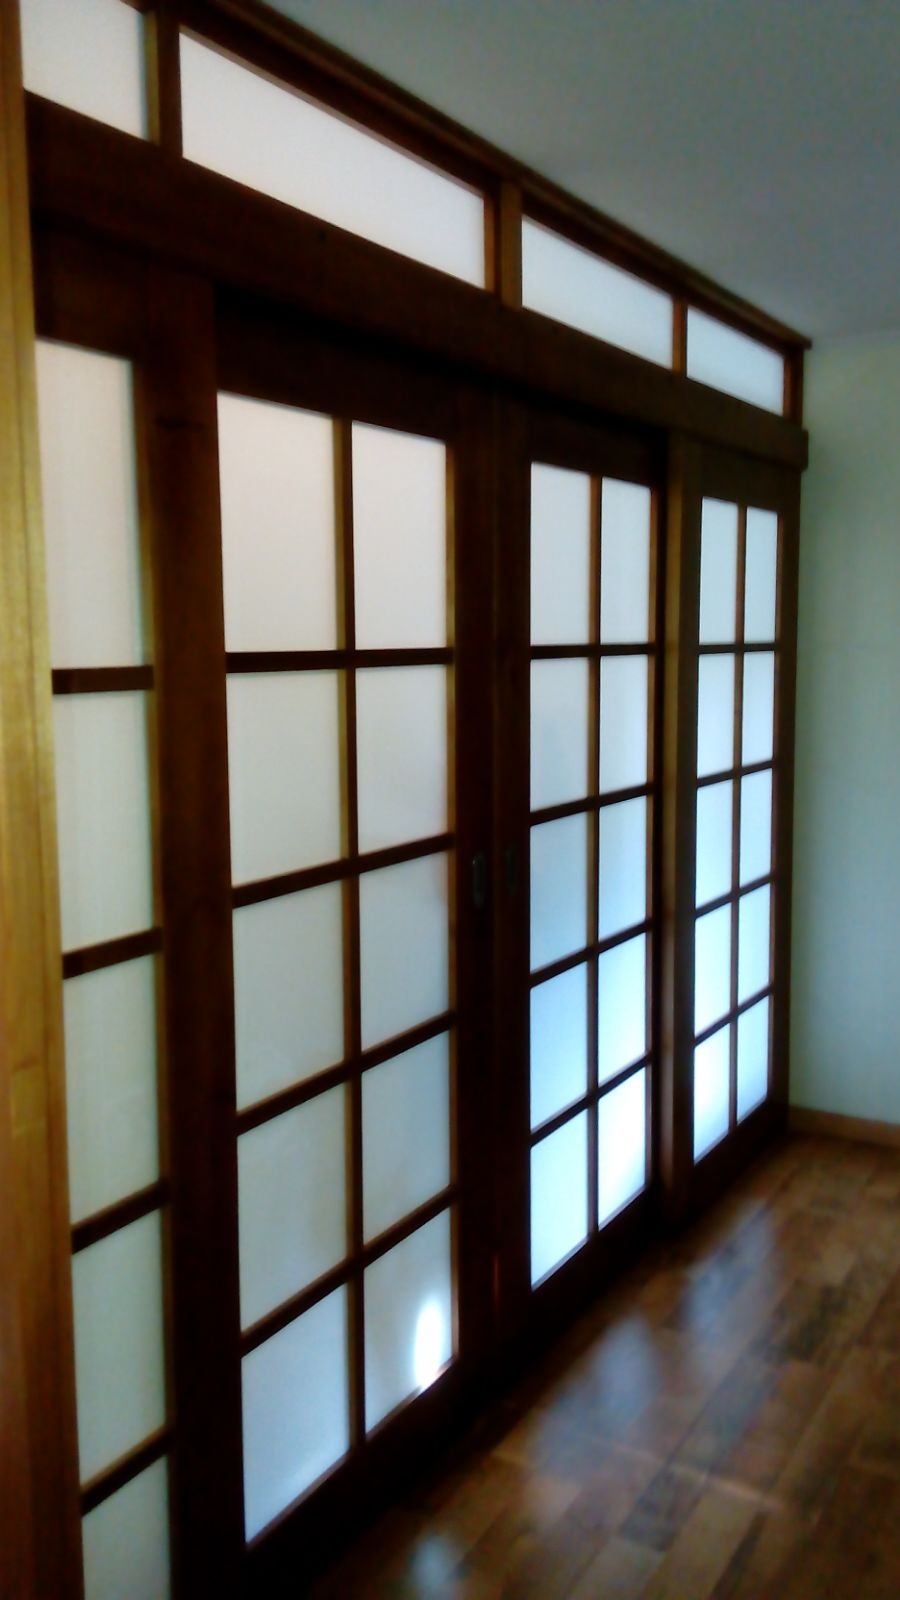 Puertas japonesas puertas correderas panels japonesas - Puertas shoji ...